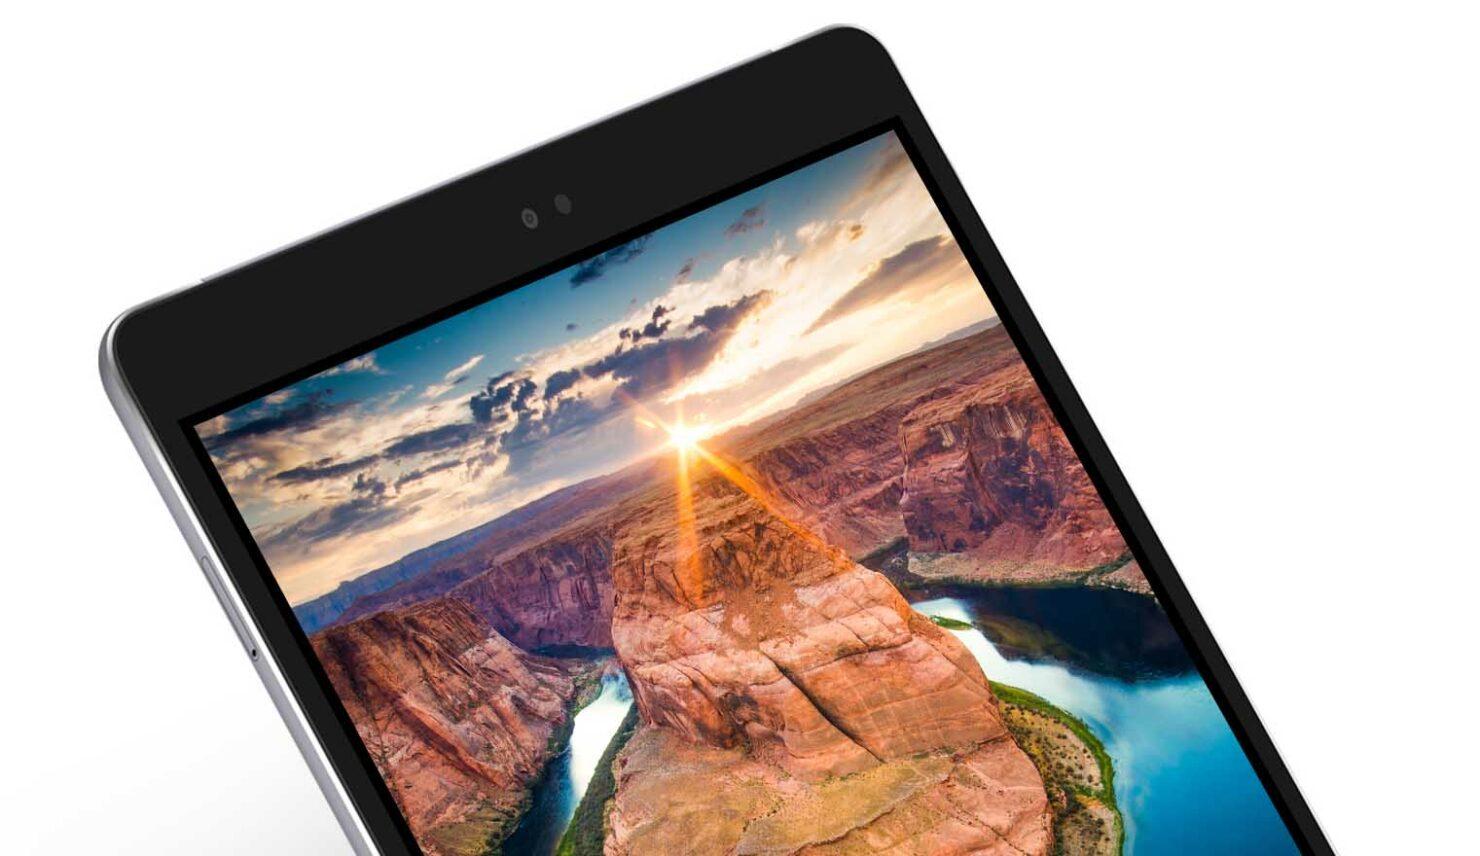 ASUS ZenPad 3S 10 LTE modem powerful internals